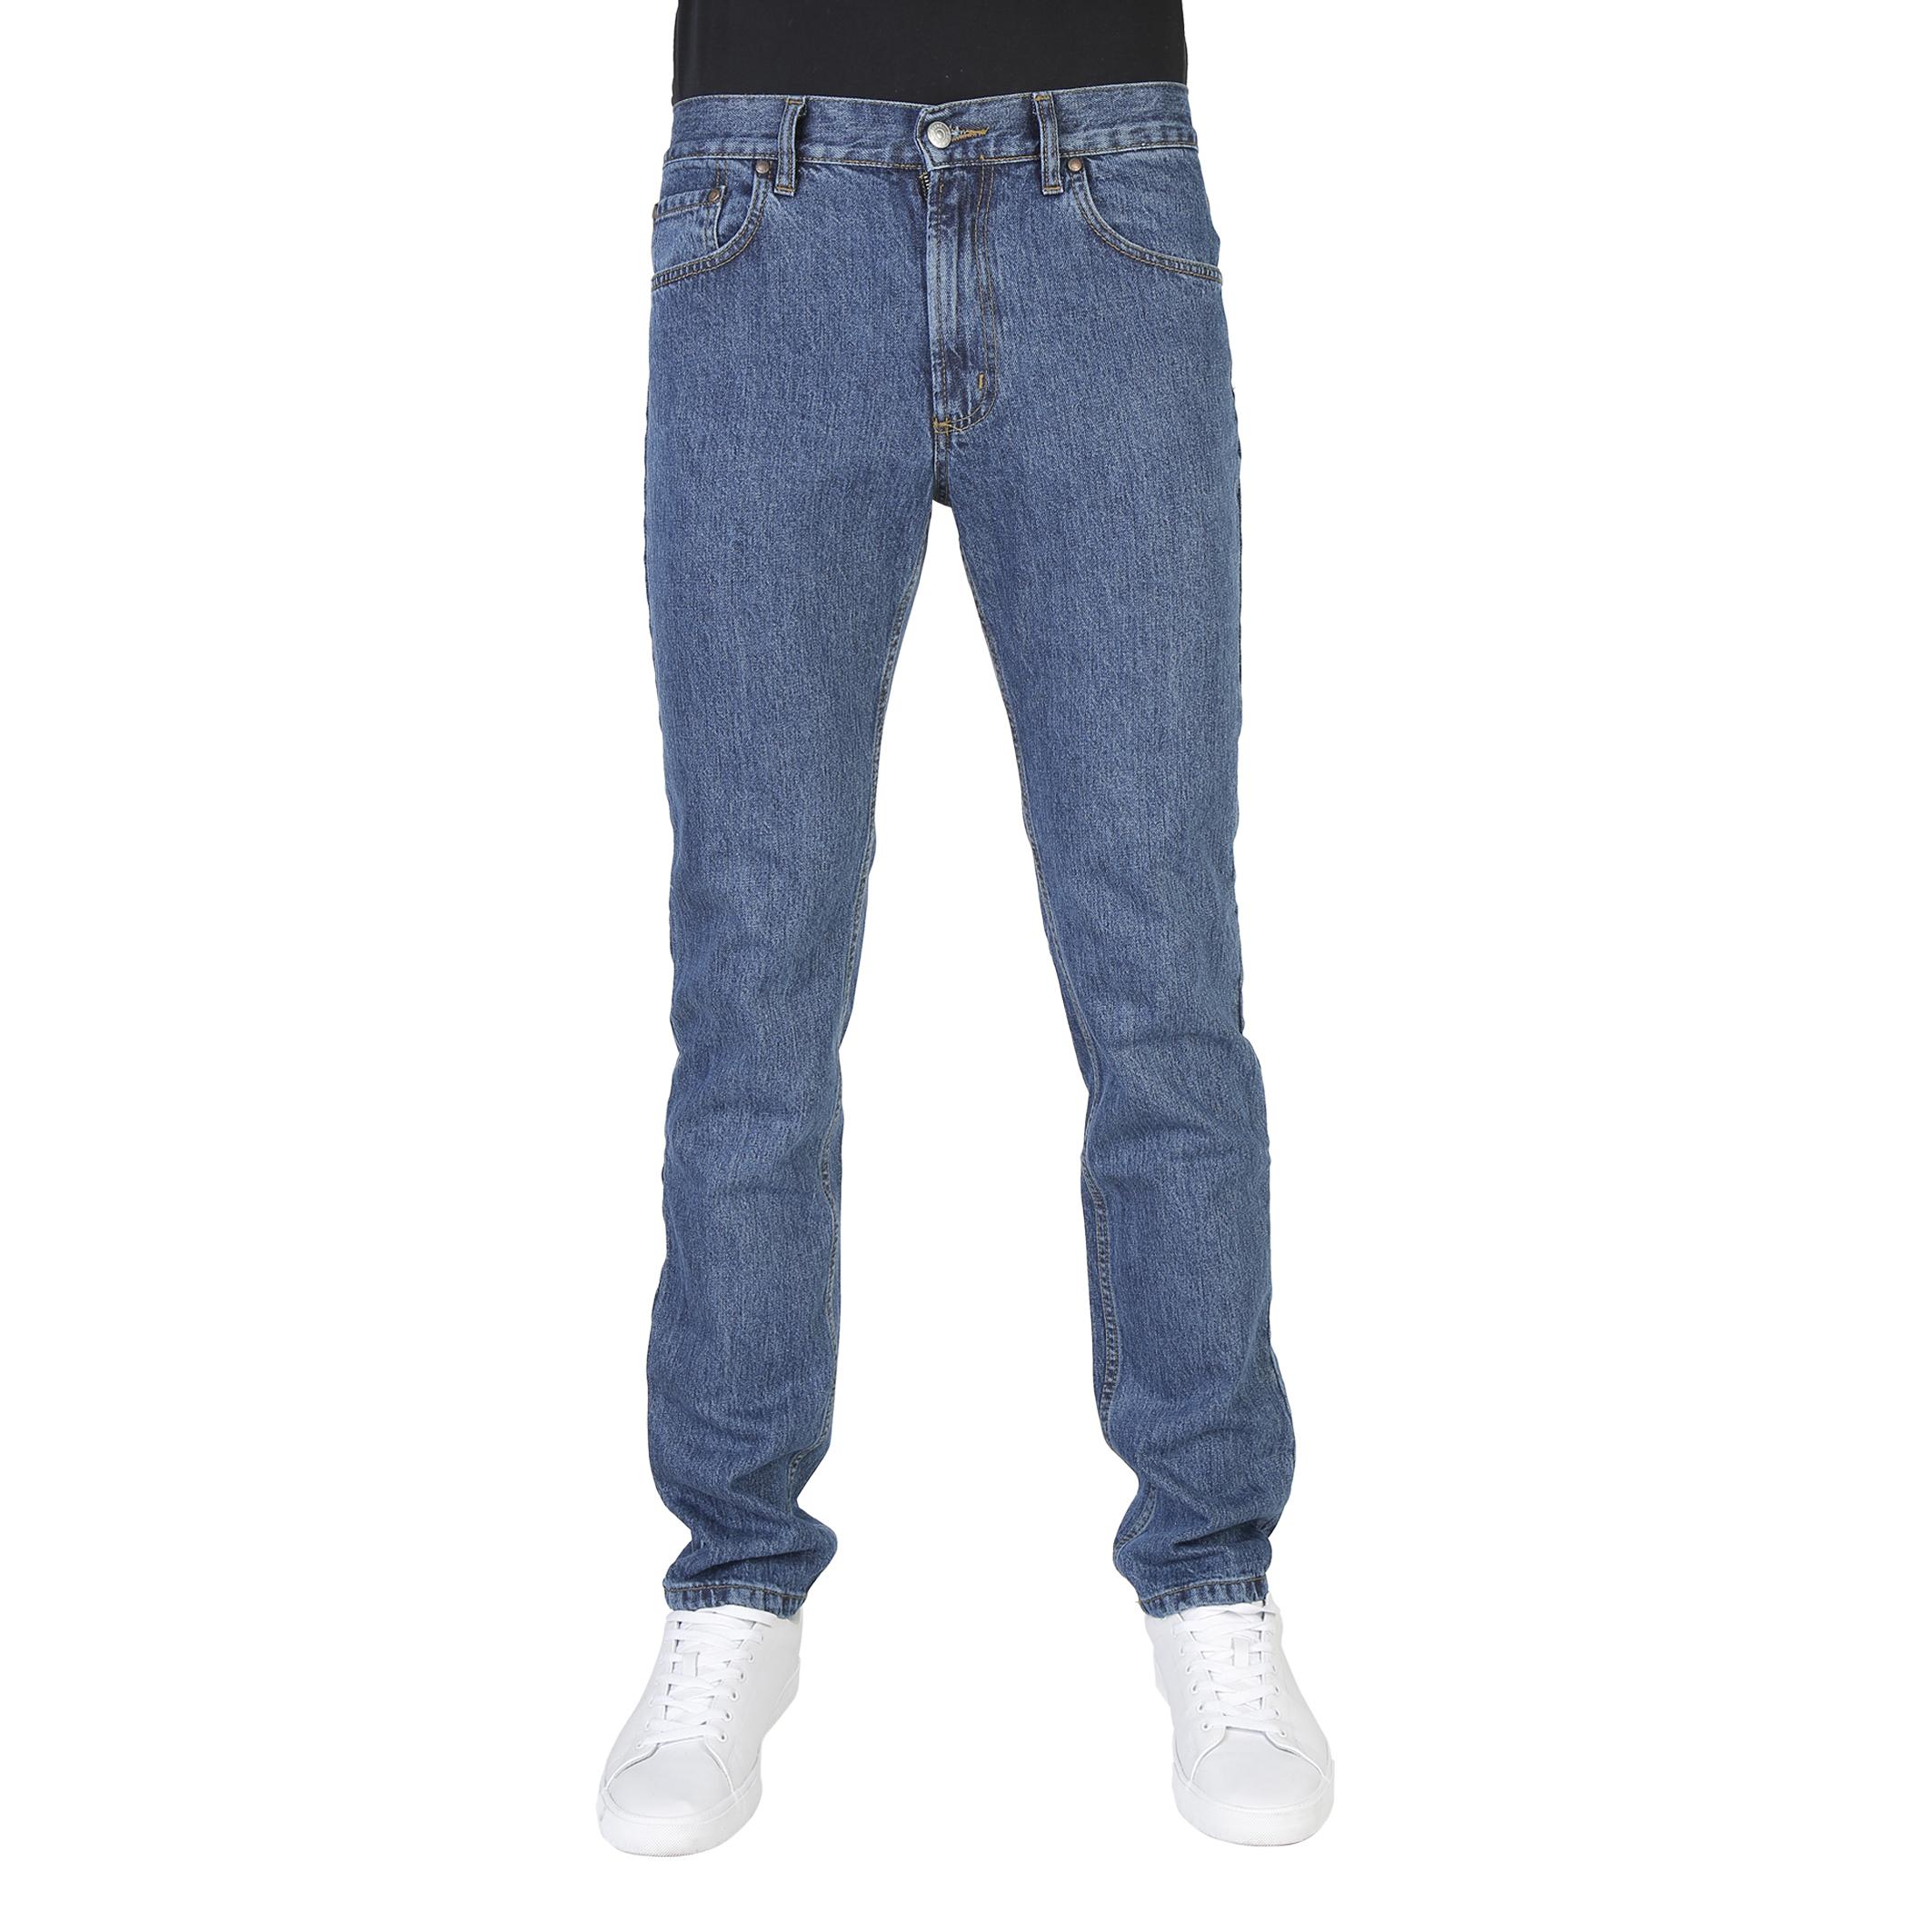 Carrera Jeans 000700 01021